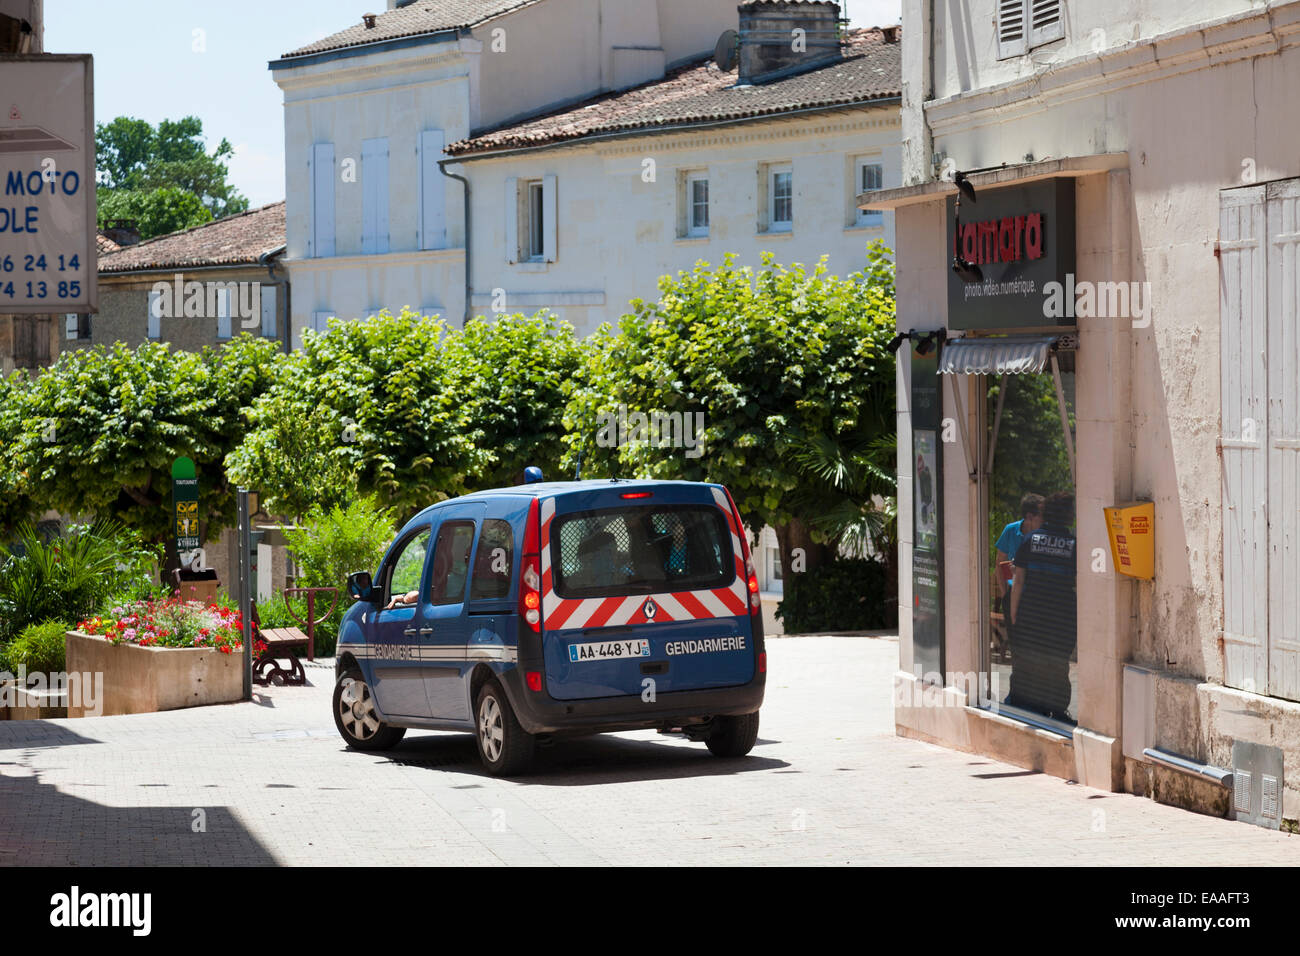 Gendarmerie French police van on quiet city street - Stock Image